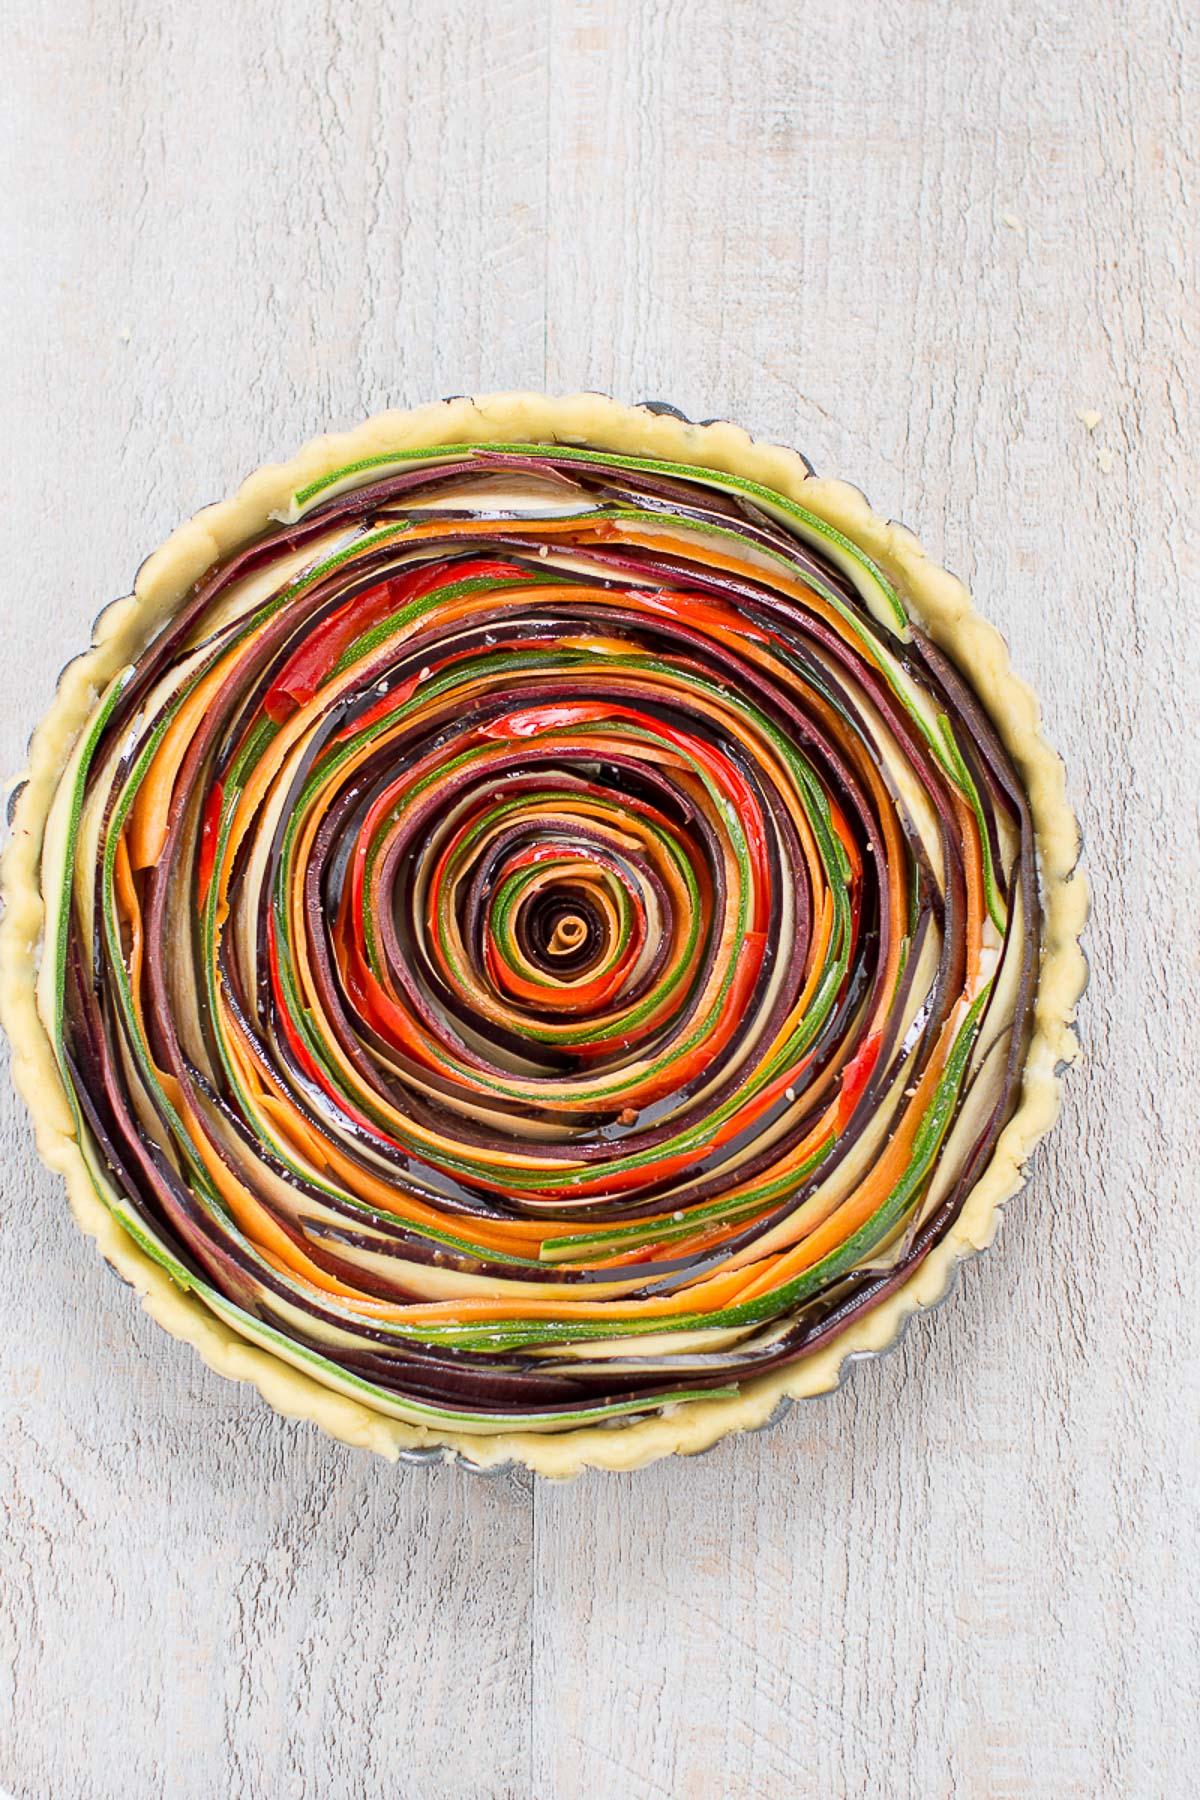 torta salata di verdure a spirale senza glutine senza uova senza burro #vegan #glutenfree vegetable spiral tart